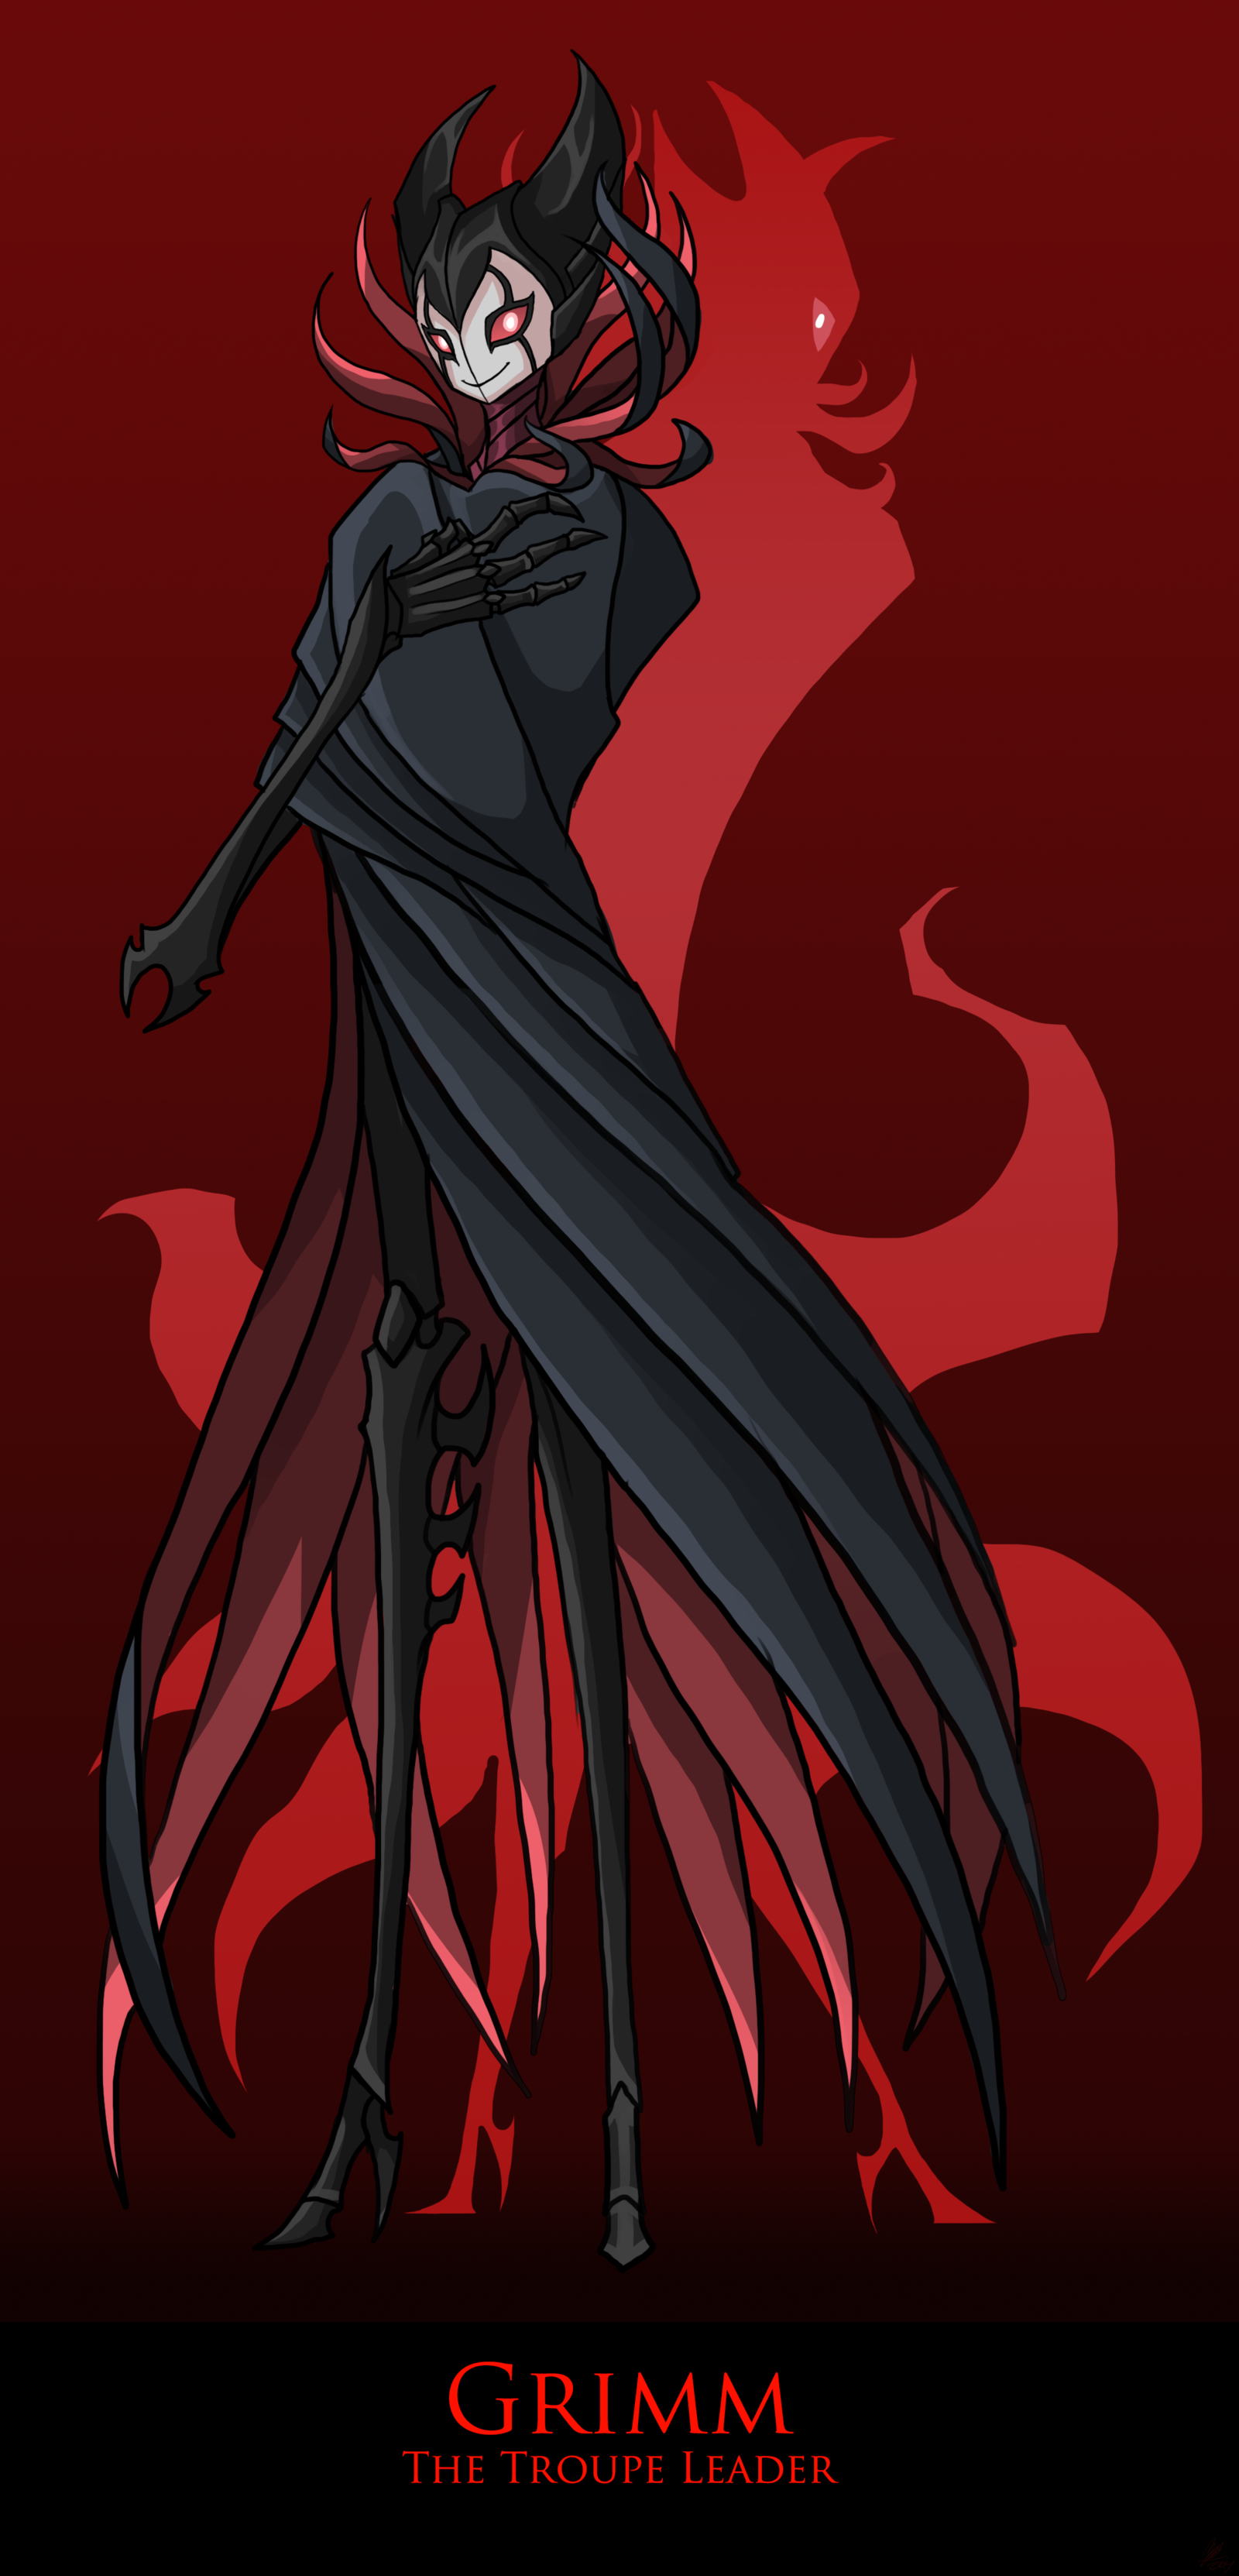 Grimm Troupe par TimeLordJikan Grimm, Knight, Hollow night